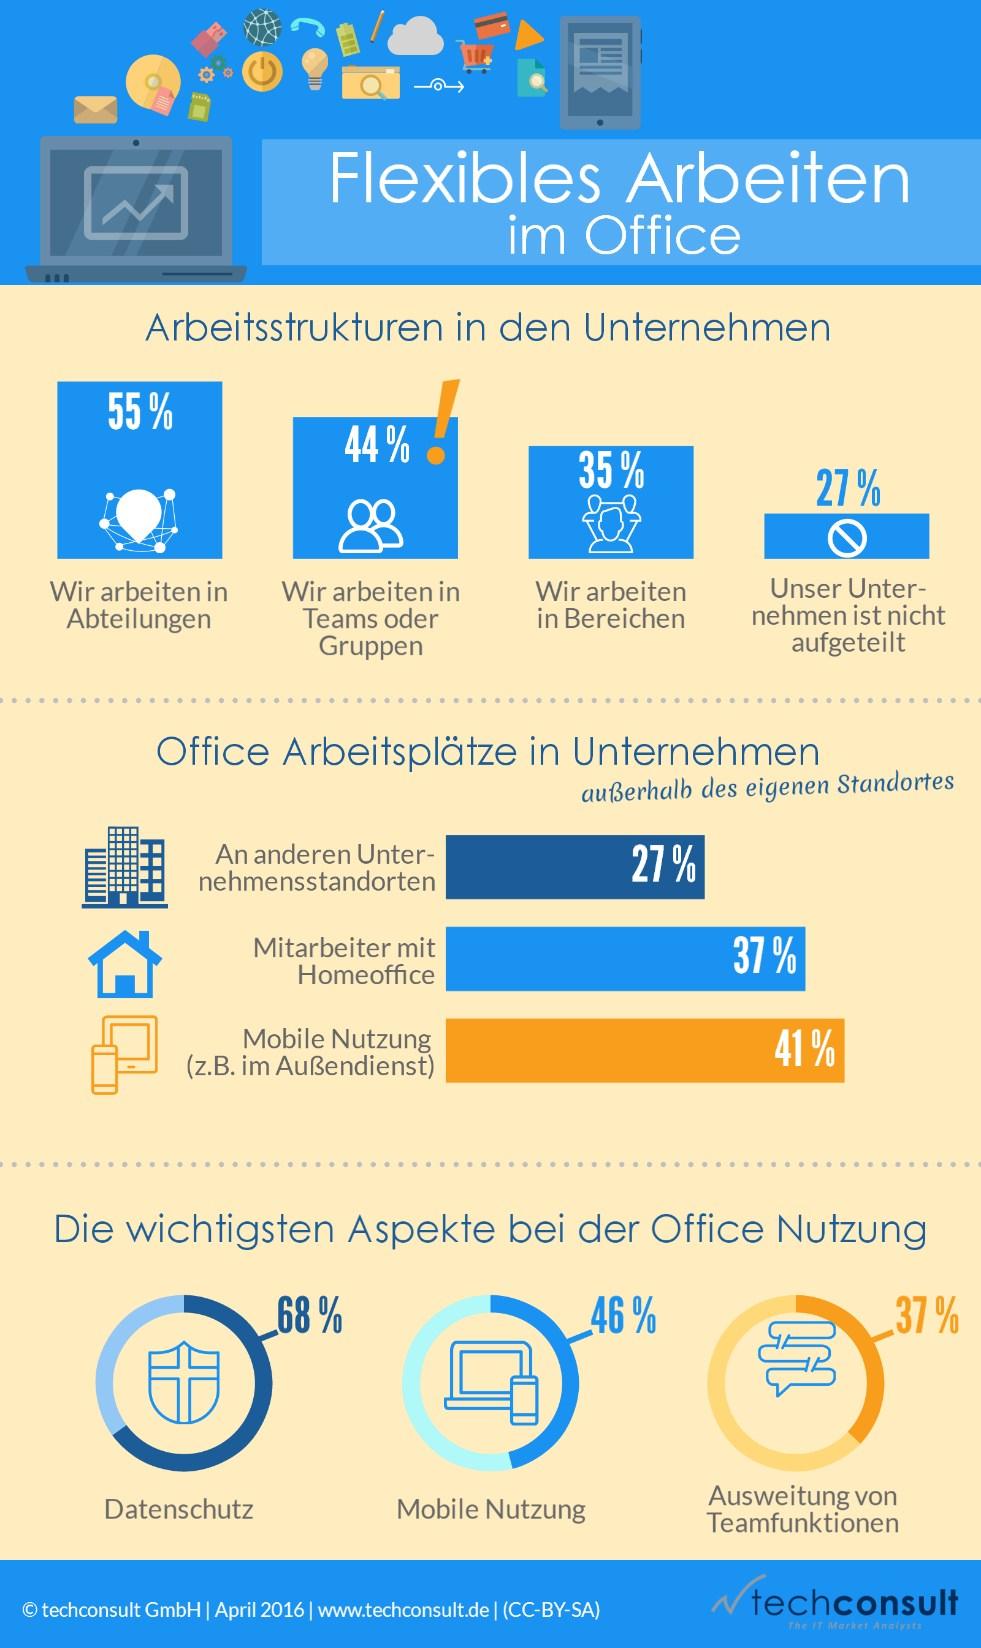 infografik techconsult flexibles arbeiten im büro